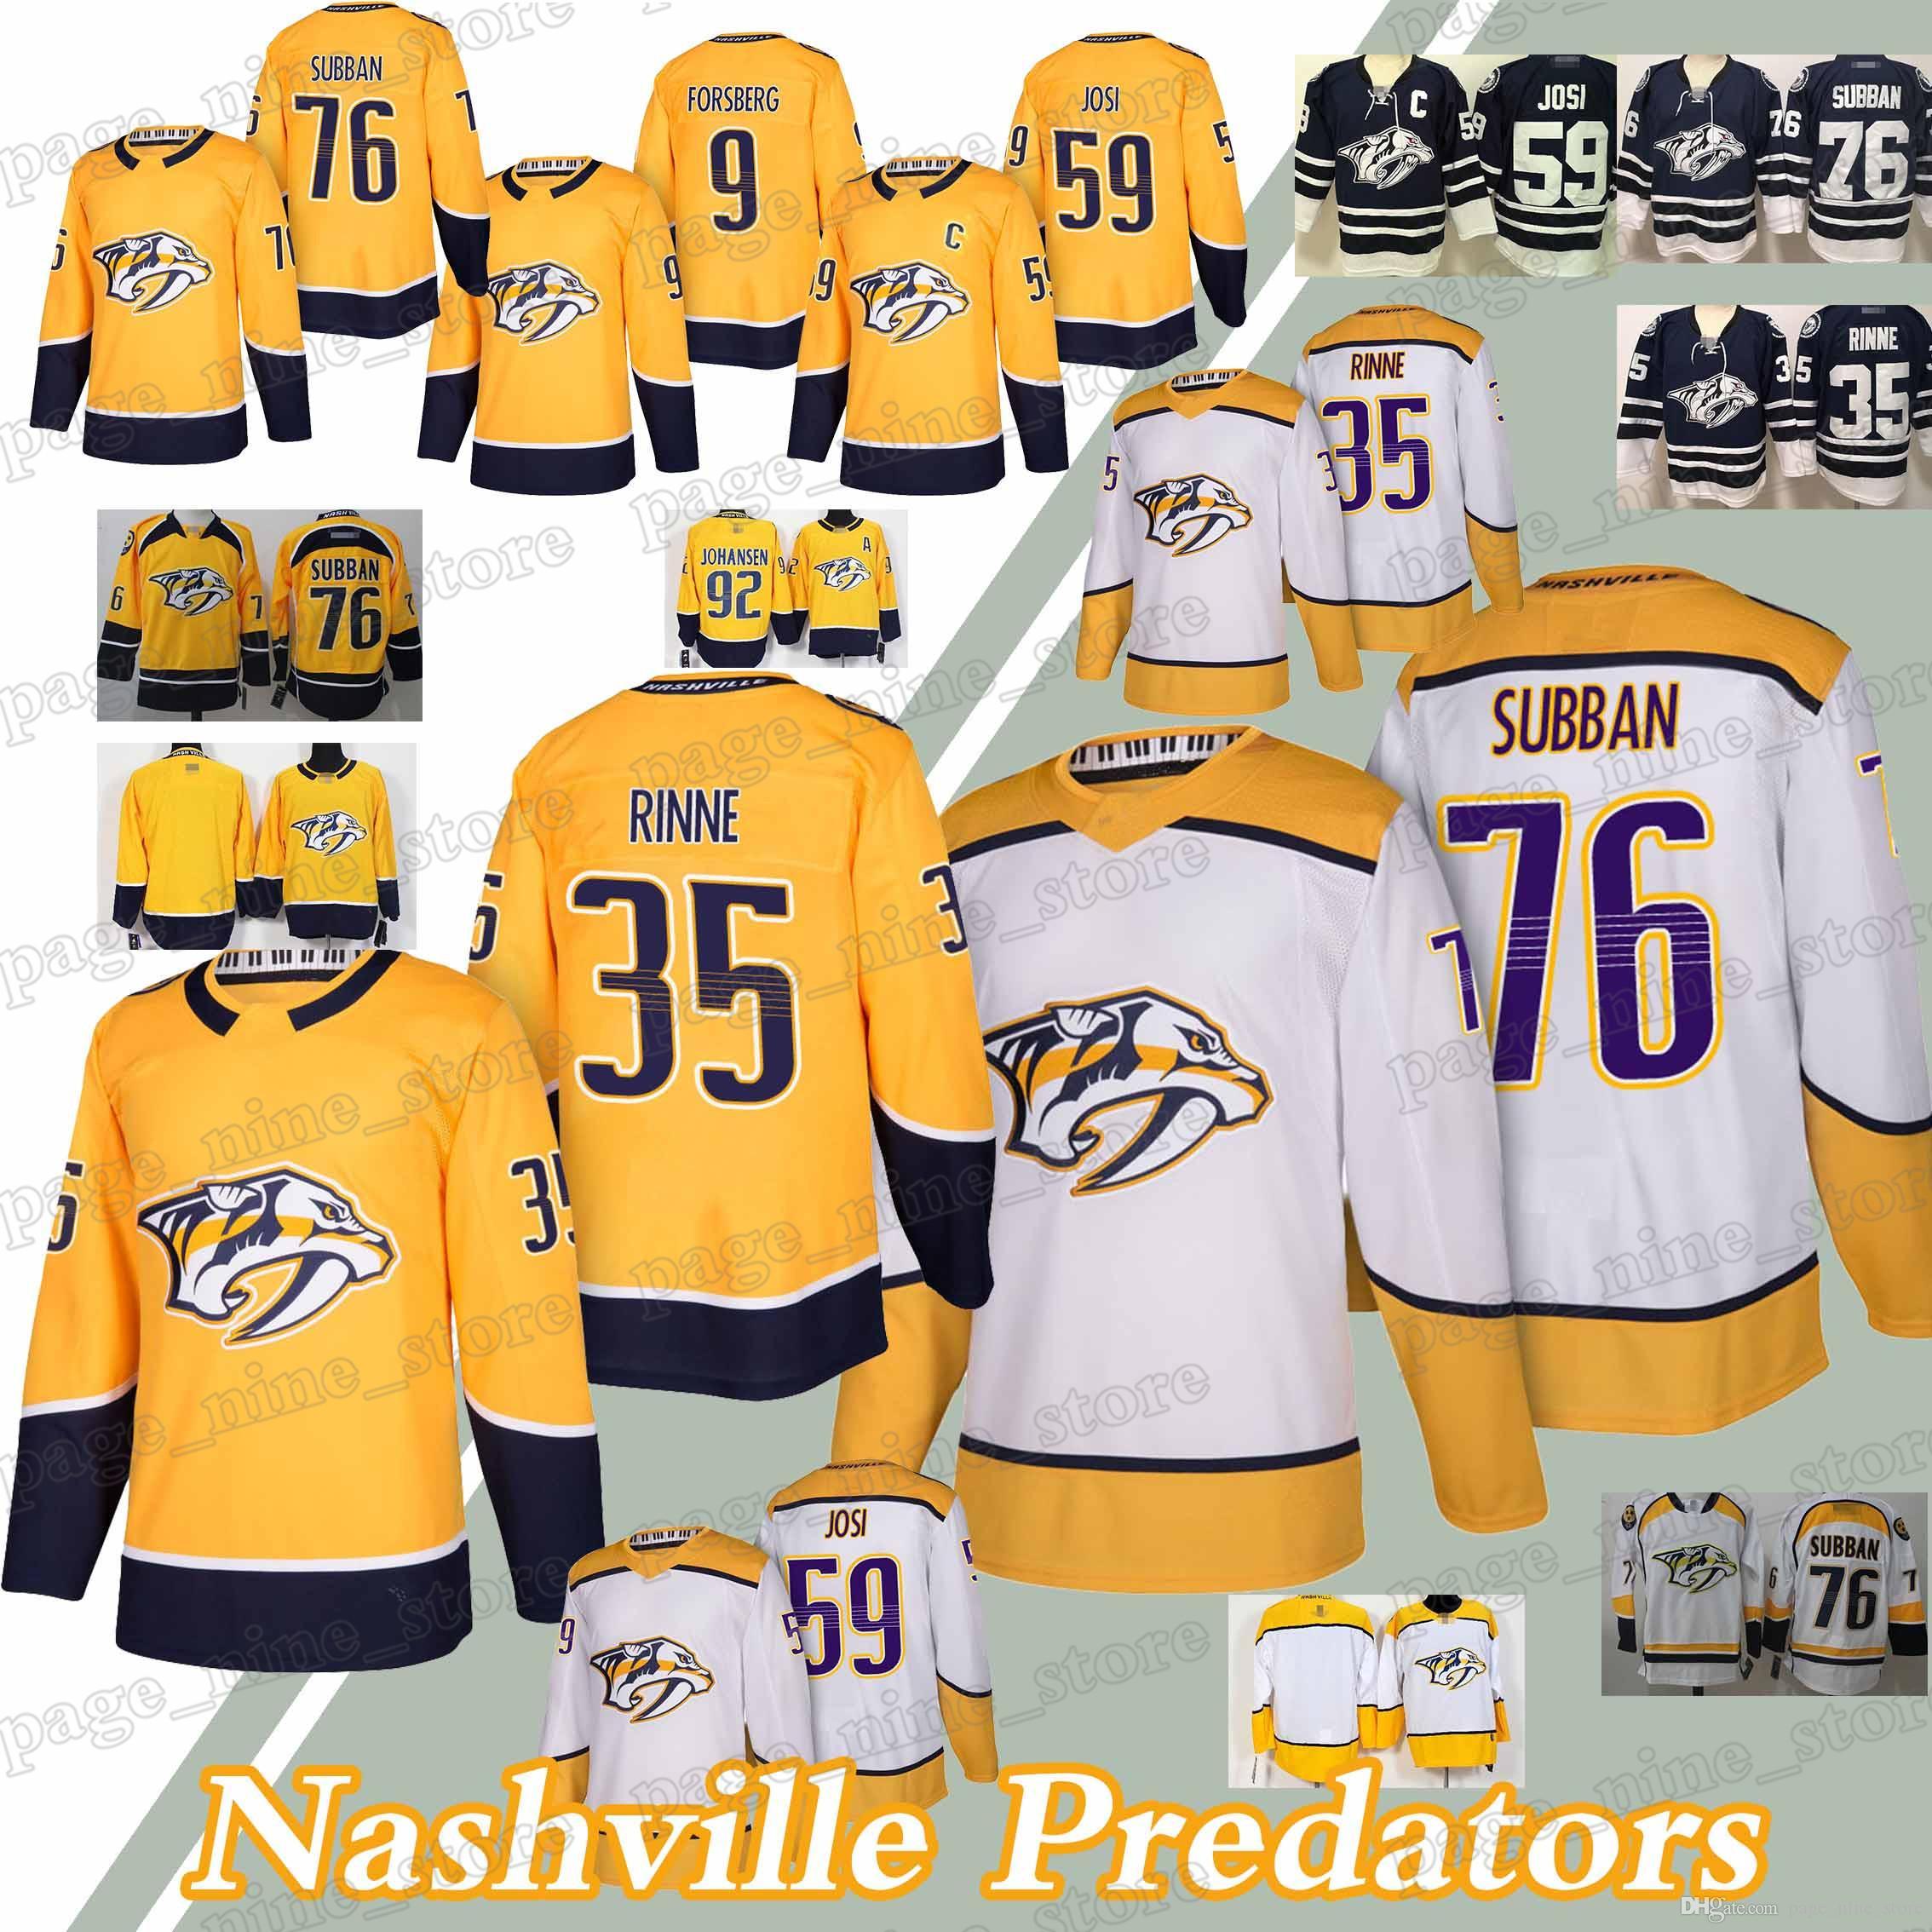 a1e07aea999 Nashville Predators Jerseys 35 Pekka Rinne 76 P.K. Subban 59 Roman ...